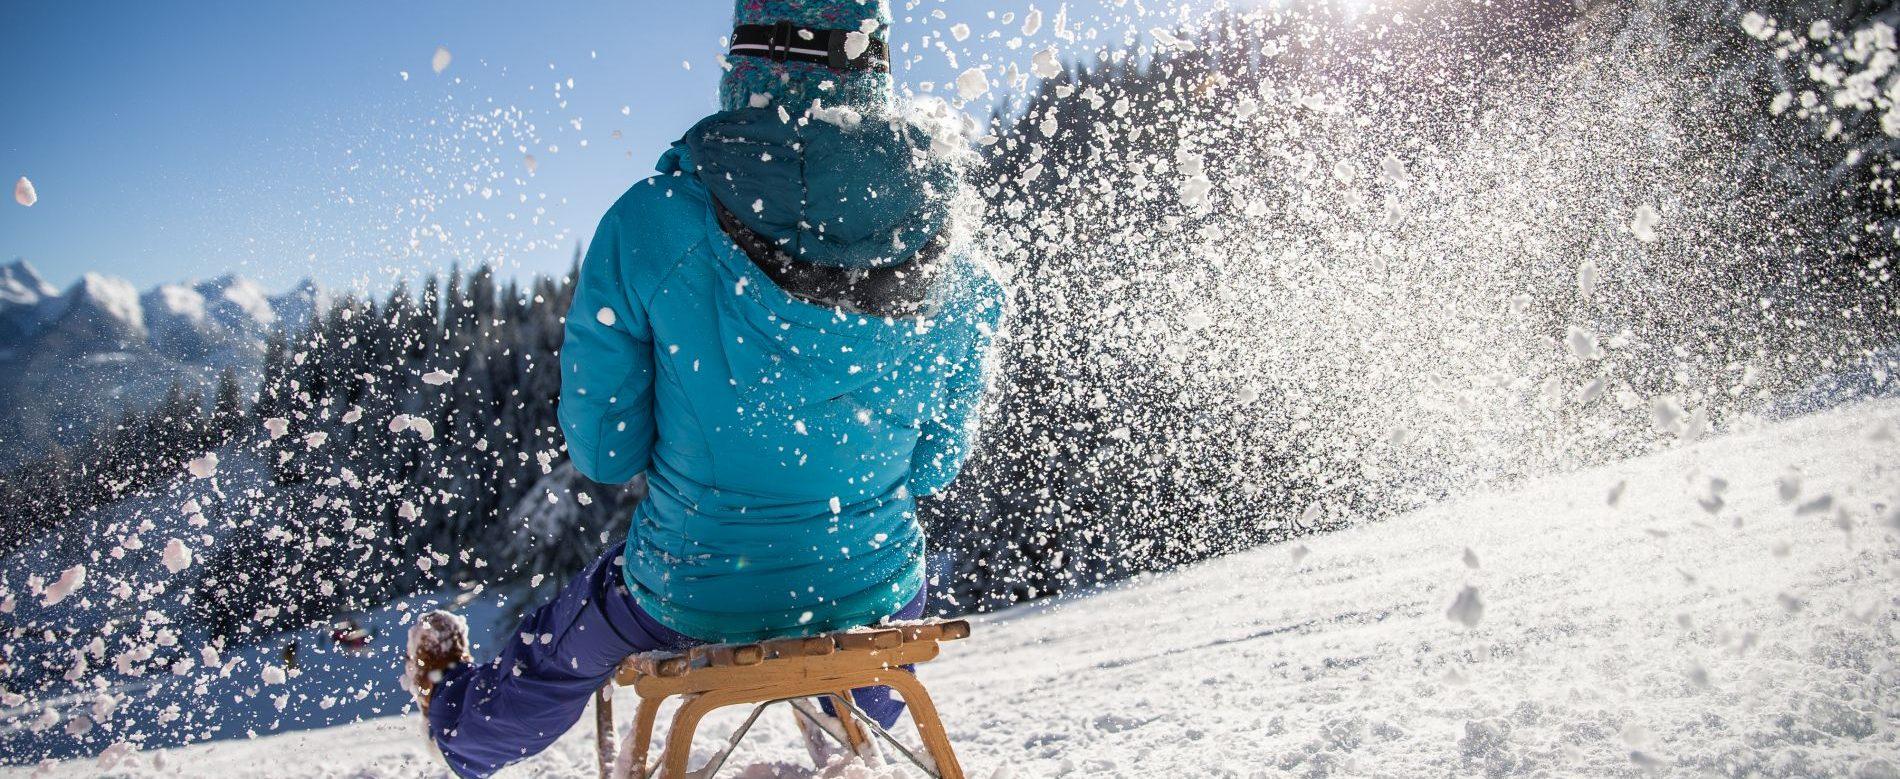 pista-slitte-predazzo-ski-center-latemar-trentino-alto-adige